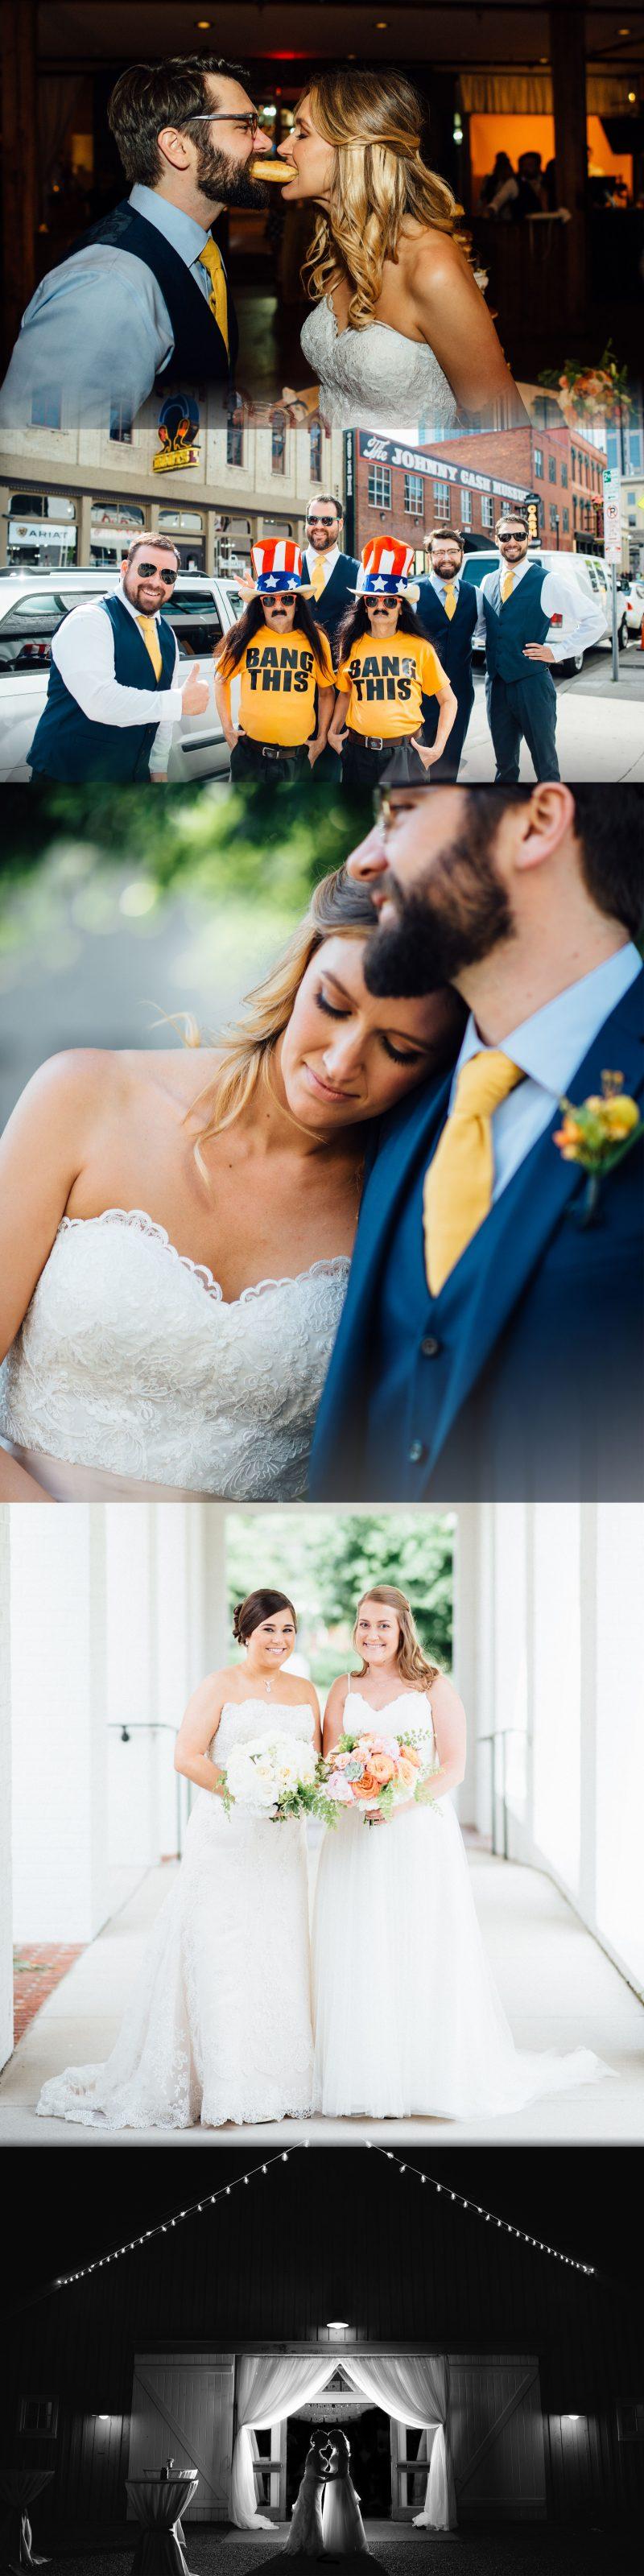 instagram4-800x3200 Best of Weddings 2016